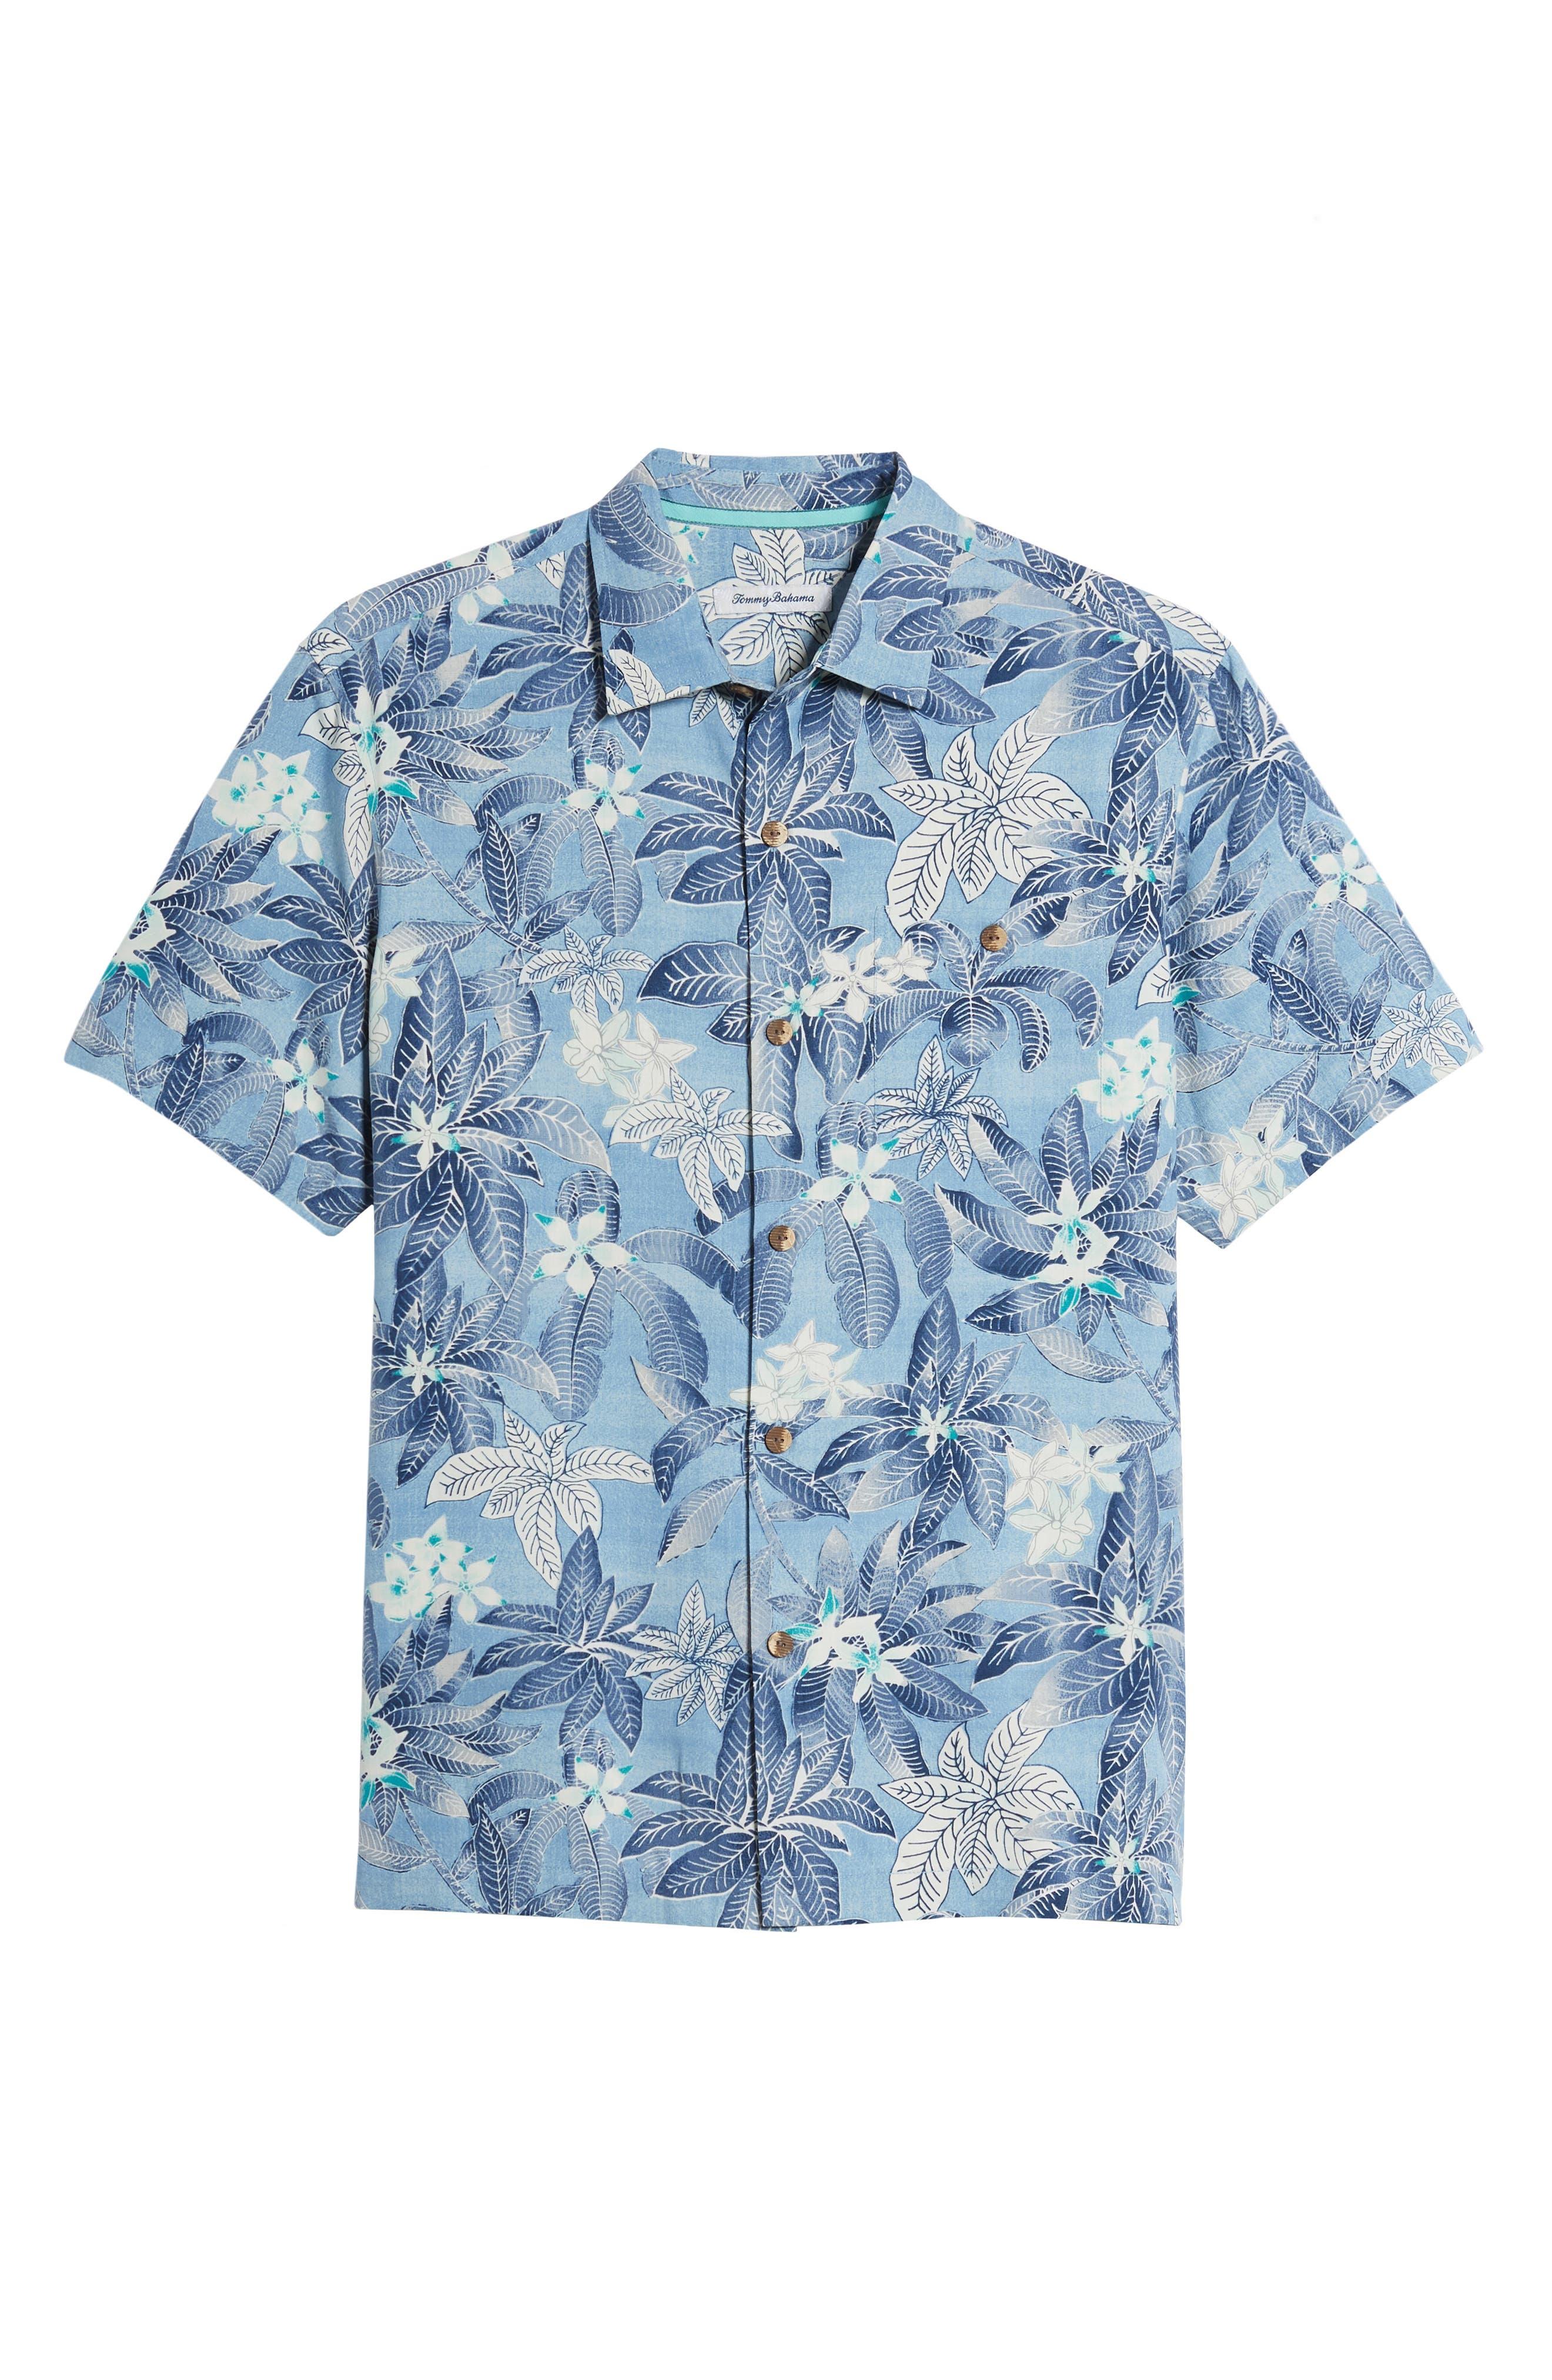 El Medano Jungle Silk Camp Shirt,                             Alternate thumbnail 6, color,                             Blue Aster